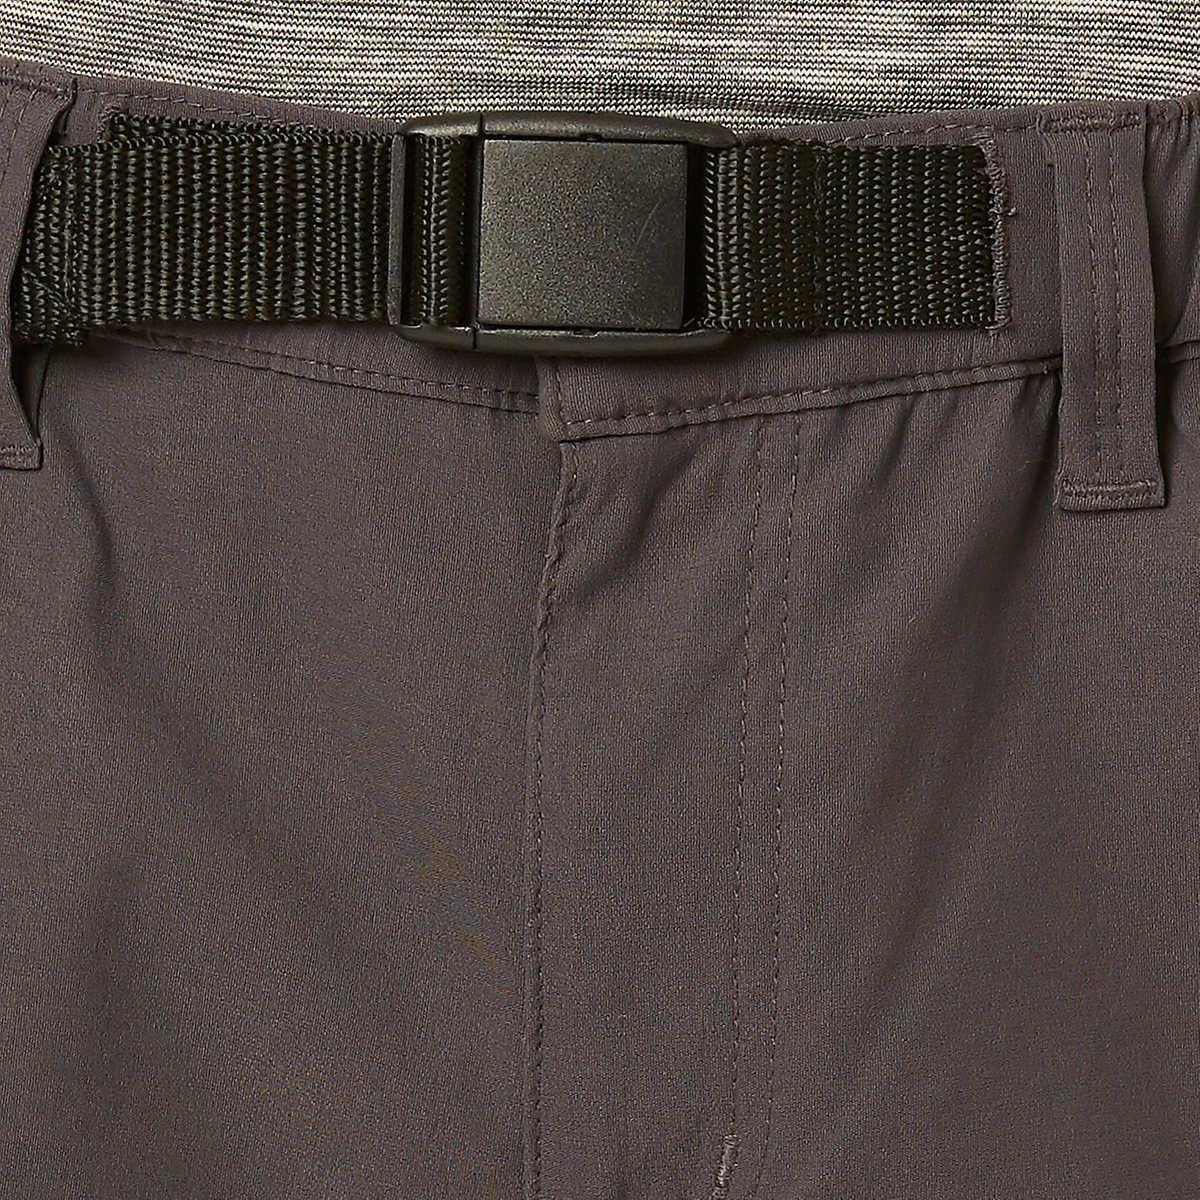 9bab4cc6c1 UNIONBAY Boy's Youth Convertible Lightweight Comfort Stretch Cargo  Pants/Shorts